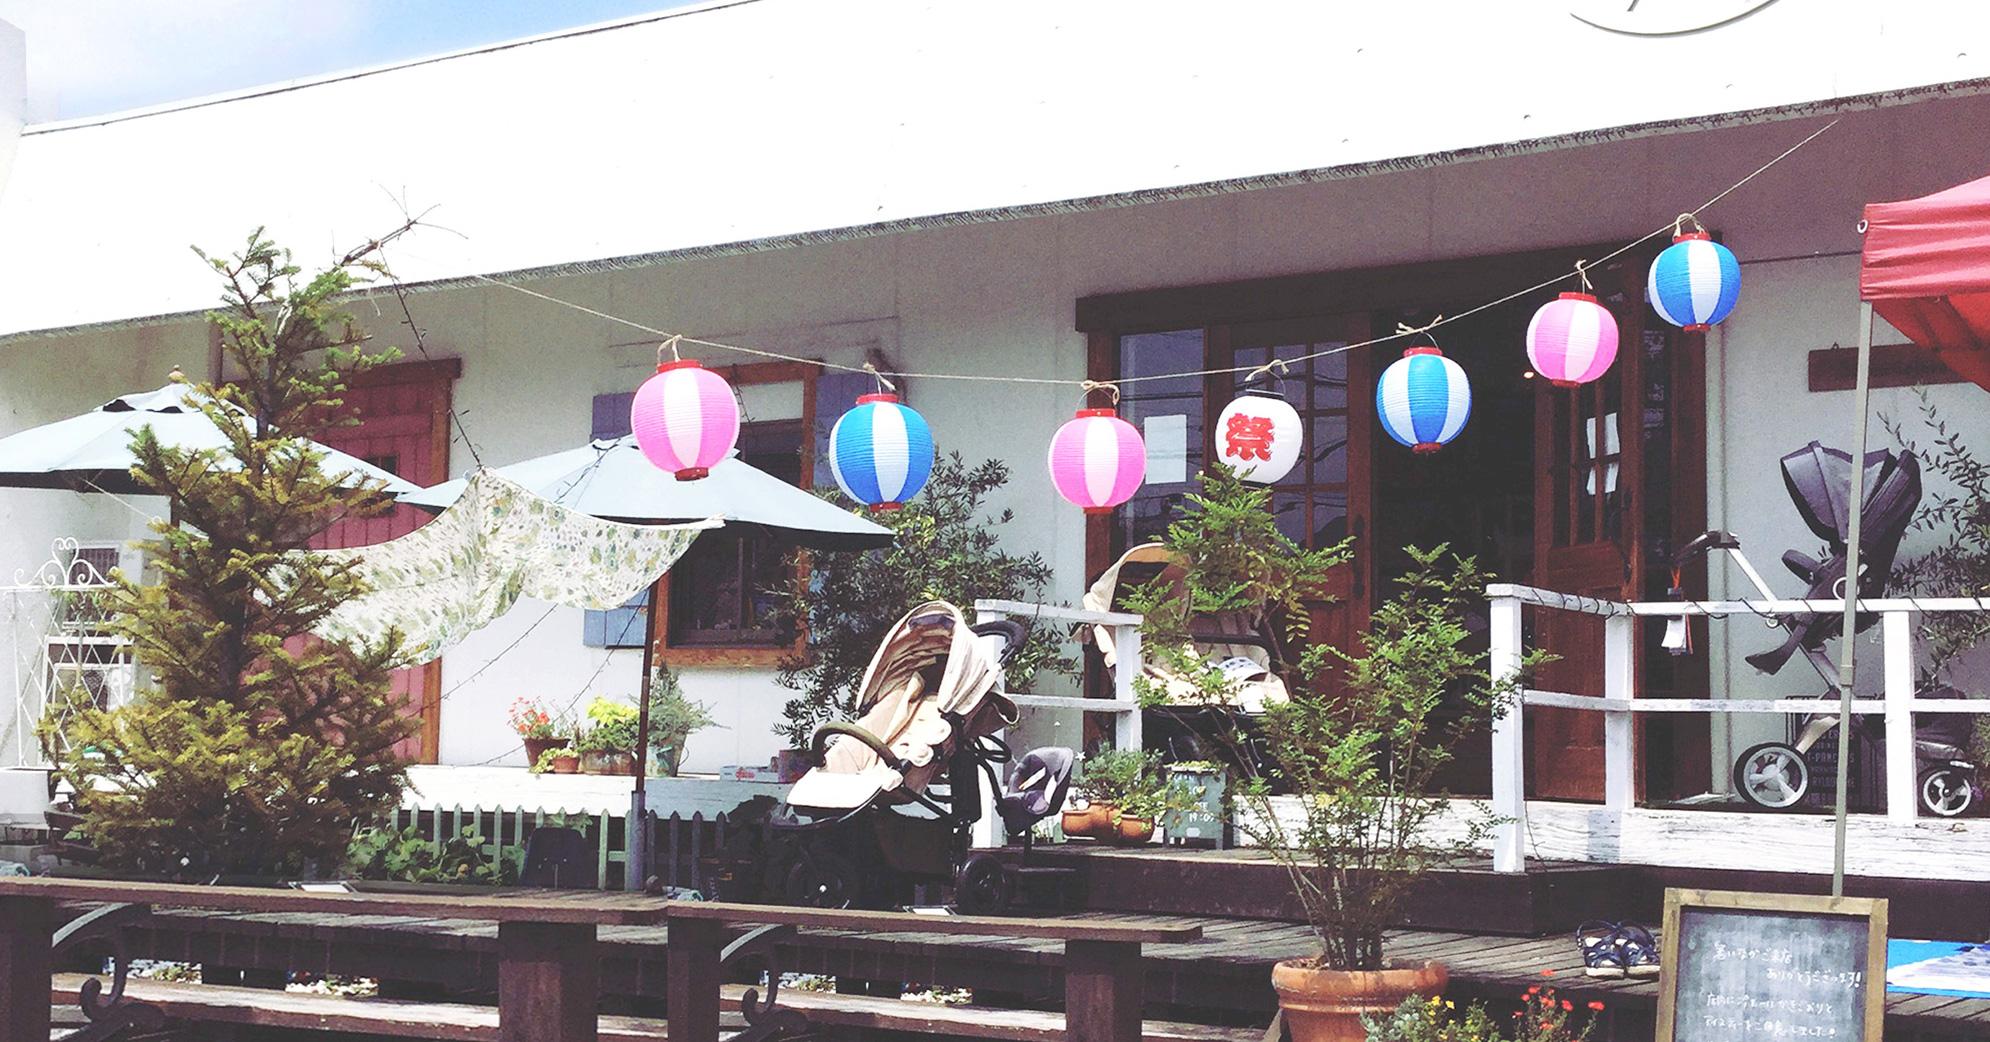 8/13(fri)~8/16(mon) Brilliant Baby 祭り